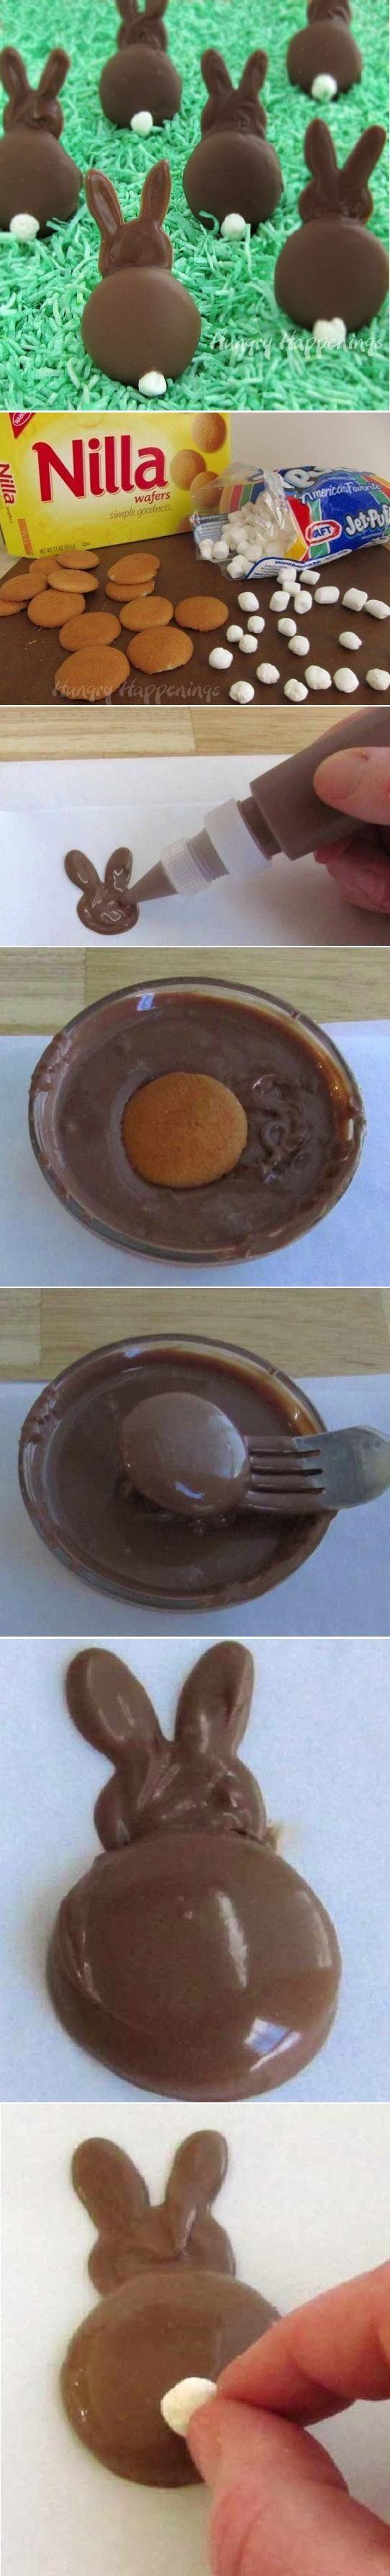 DIY Chocolate Wafer Bunny